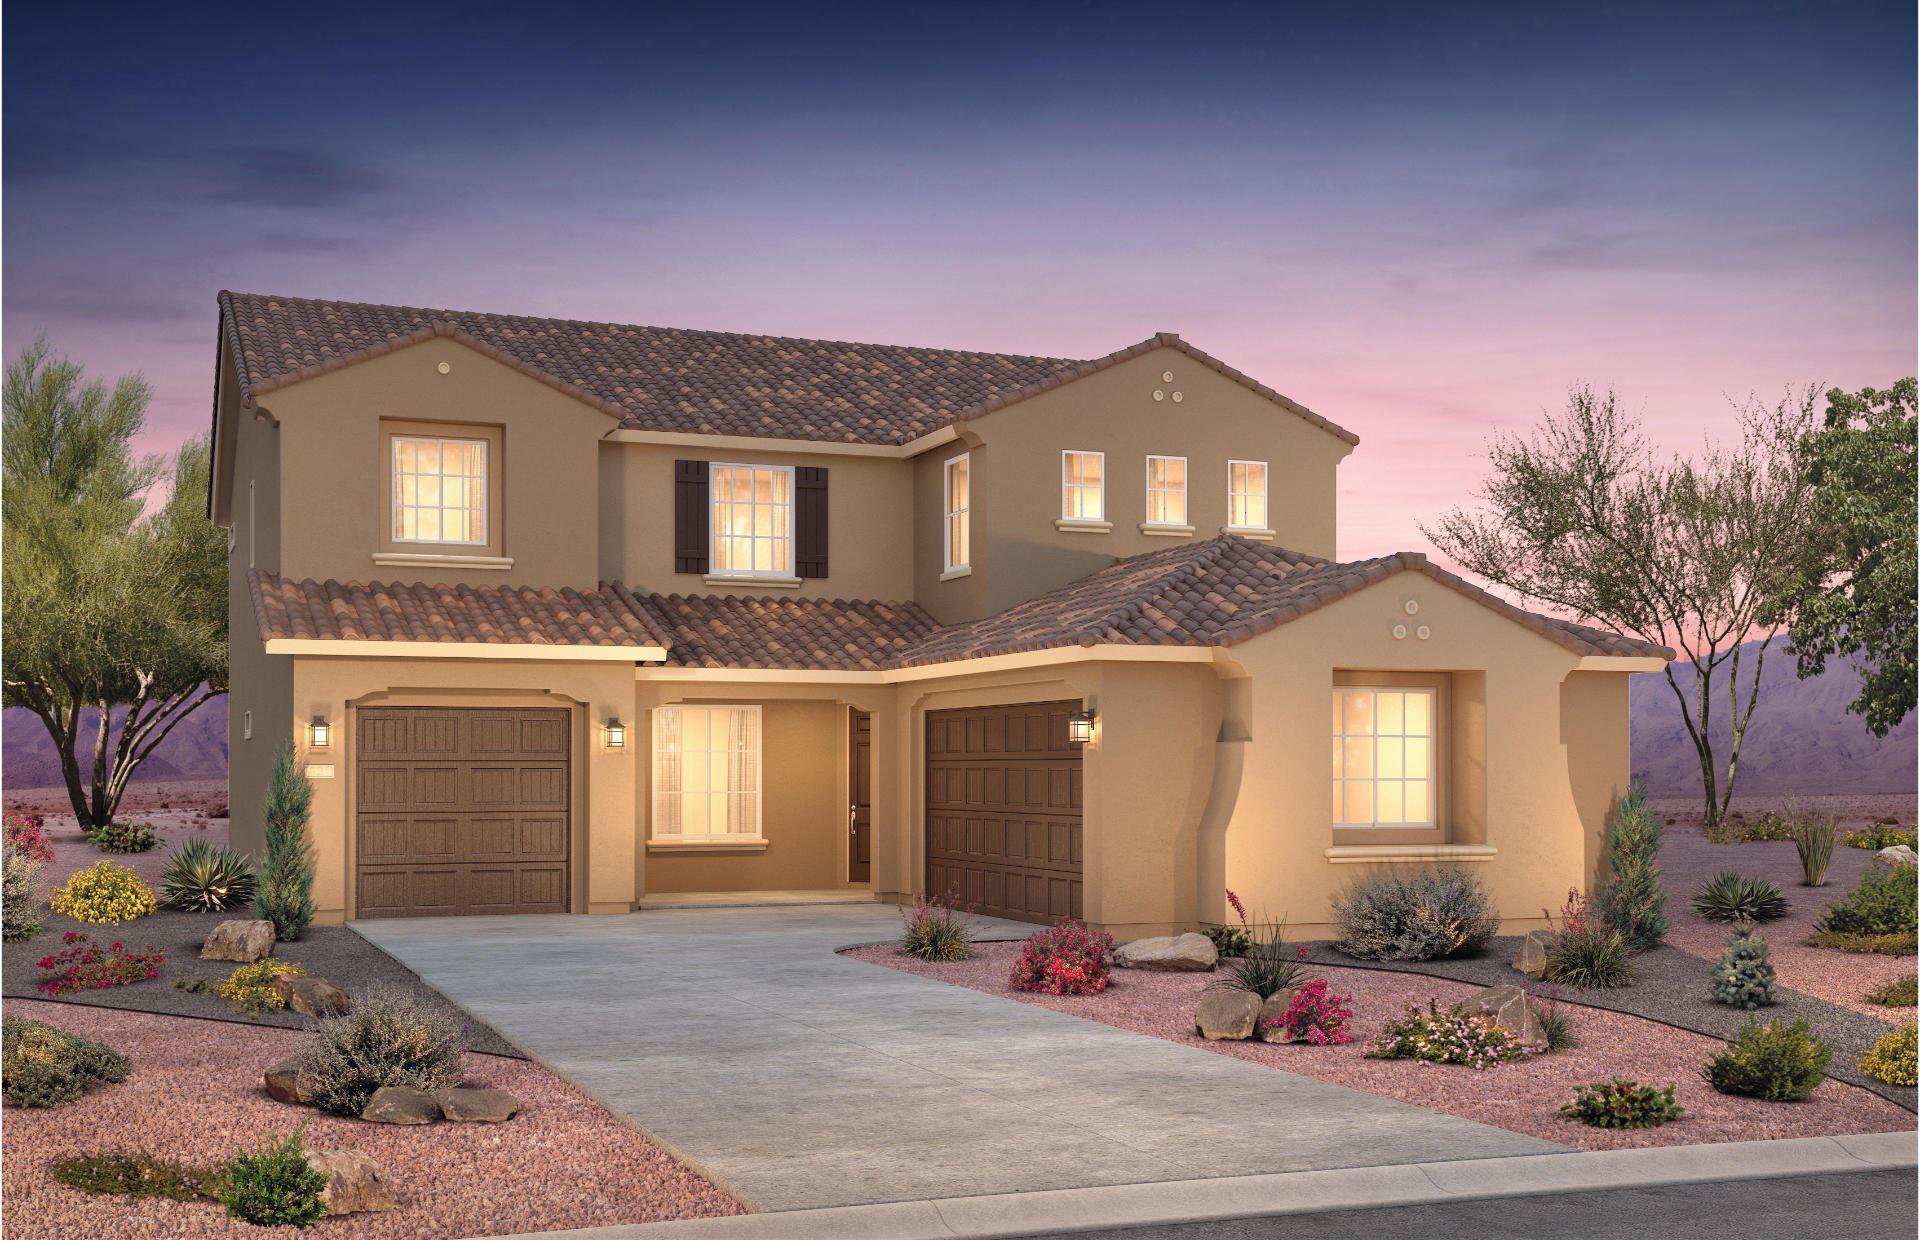 2275 Beckham Drive NE, Rio Rancho, NM 87144 - #: 999182